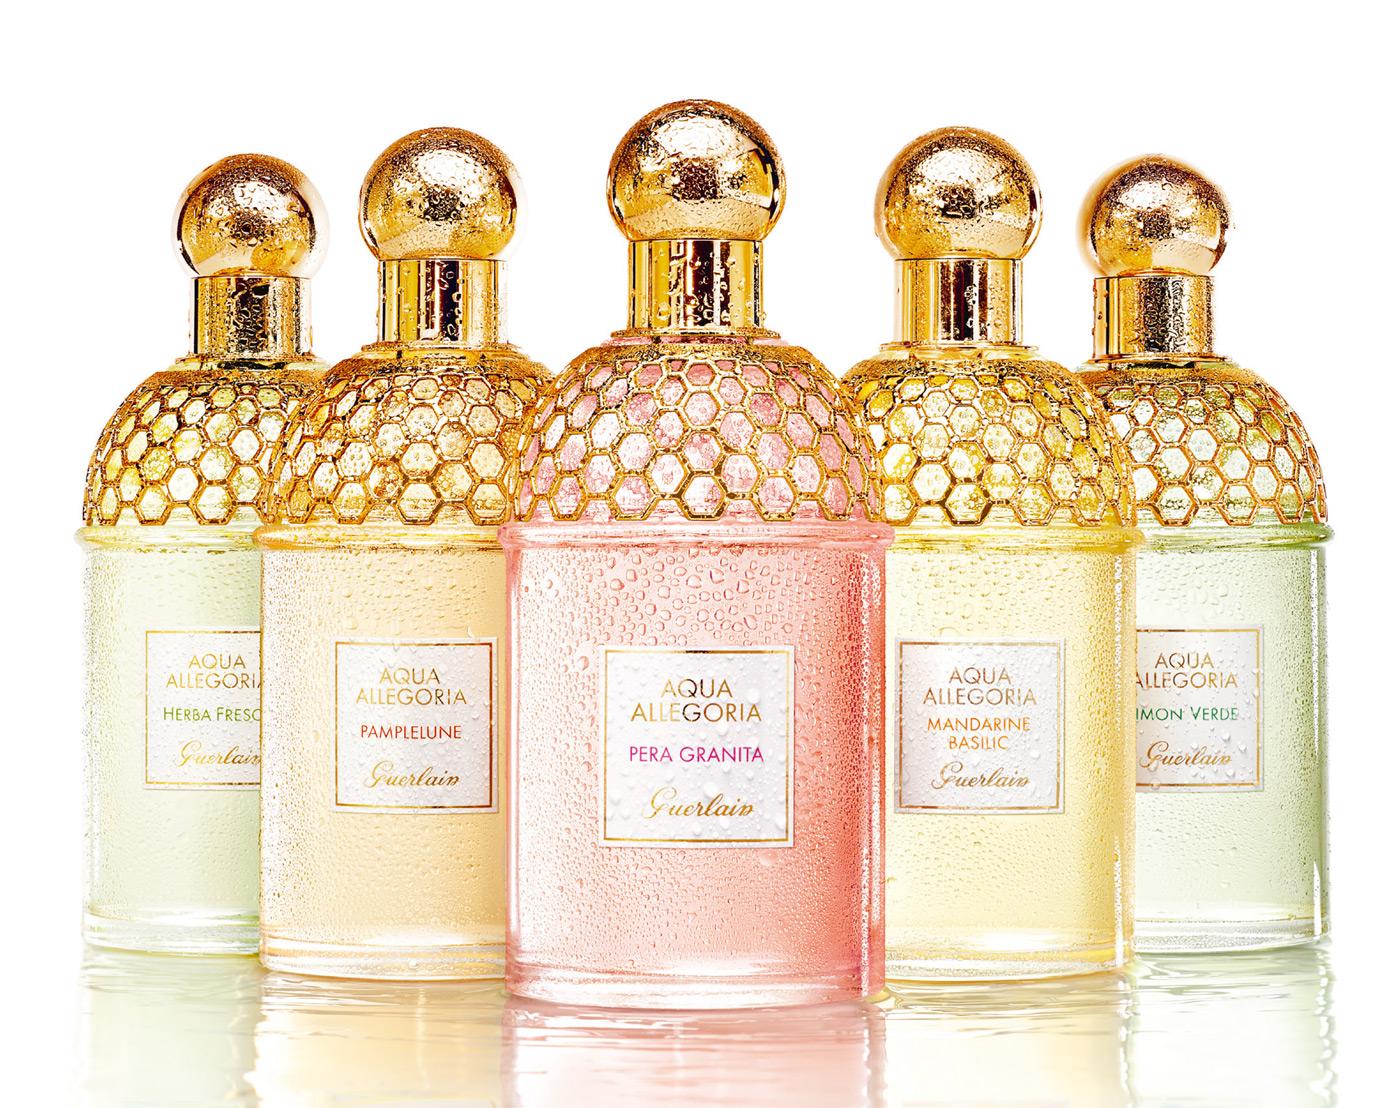 Aqua Allegoria Pera Granita Guerlain Perfume A Fragrance For Women